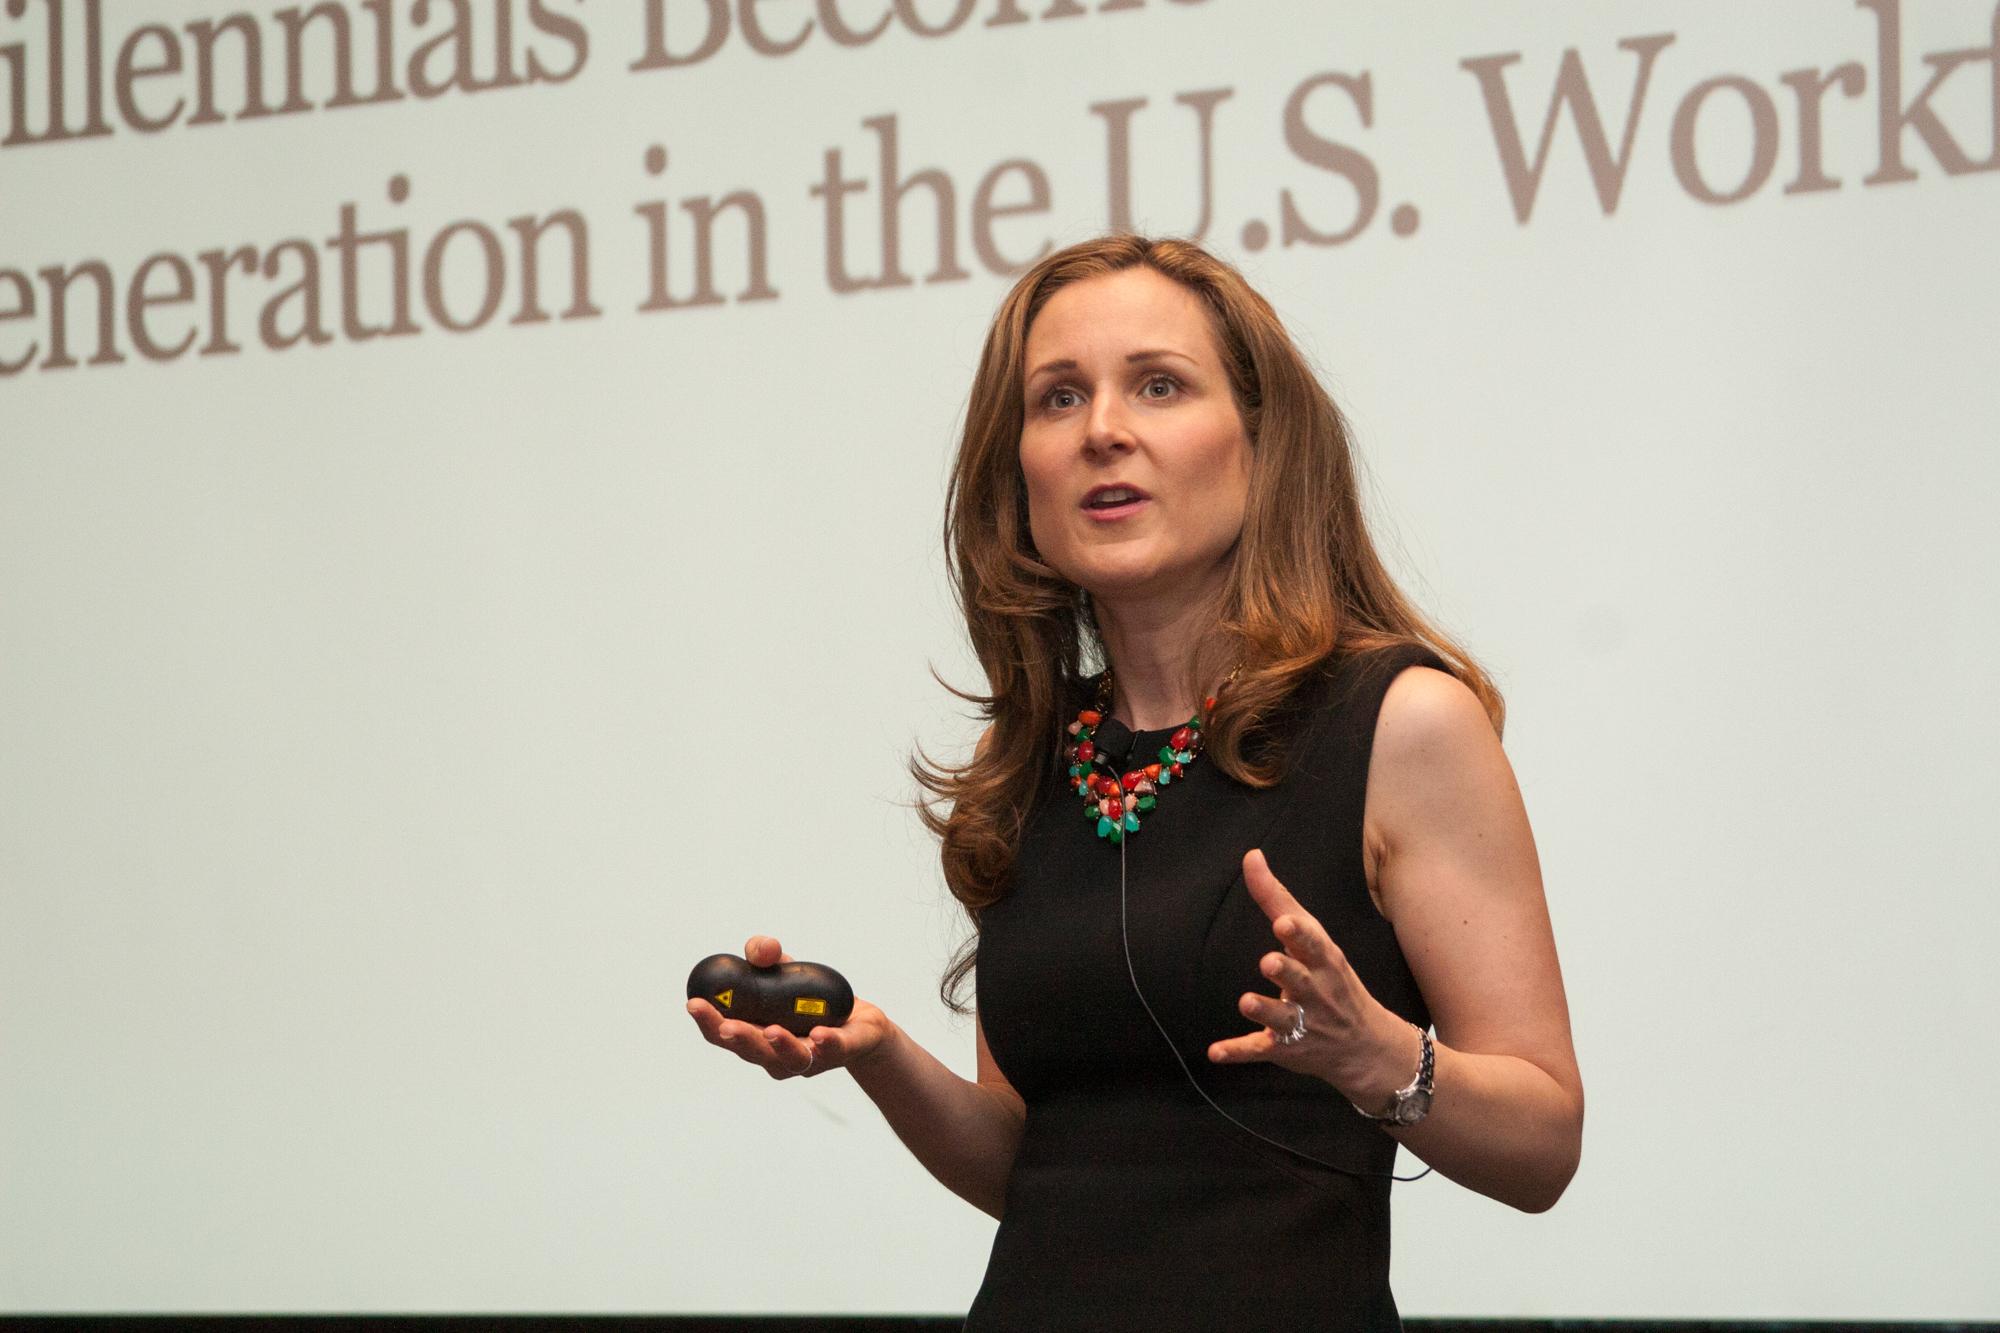 Lindsey Pollak workplace expert speaker